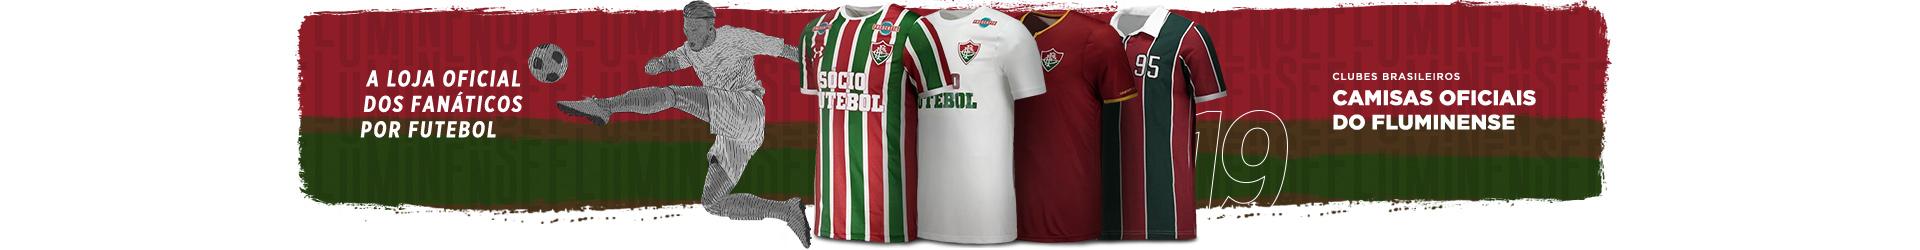 868b60ebcef52 Camisas e Produtos Oficiais do Fluminense - FutFanatics